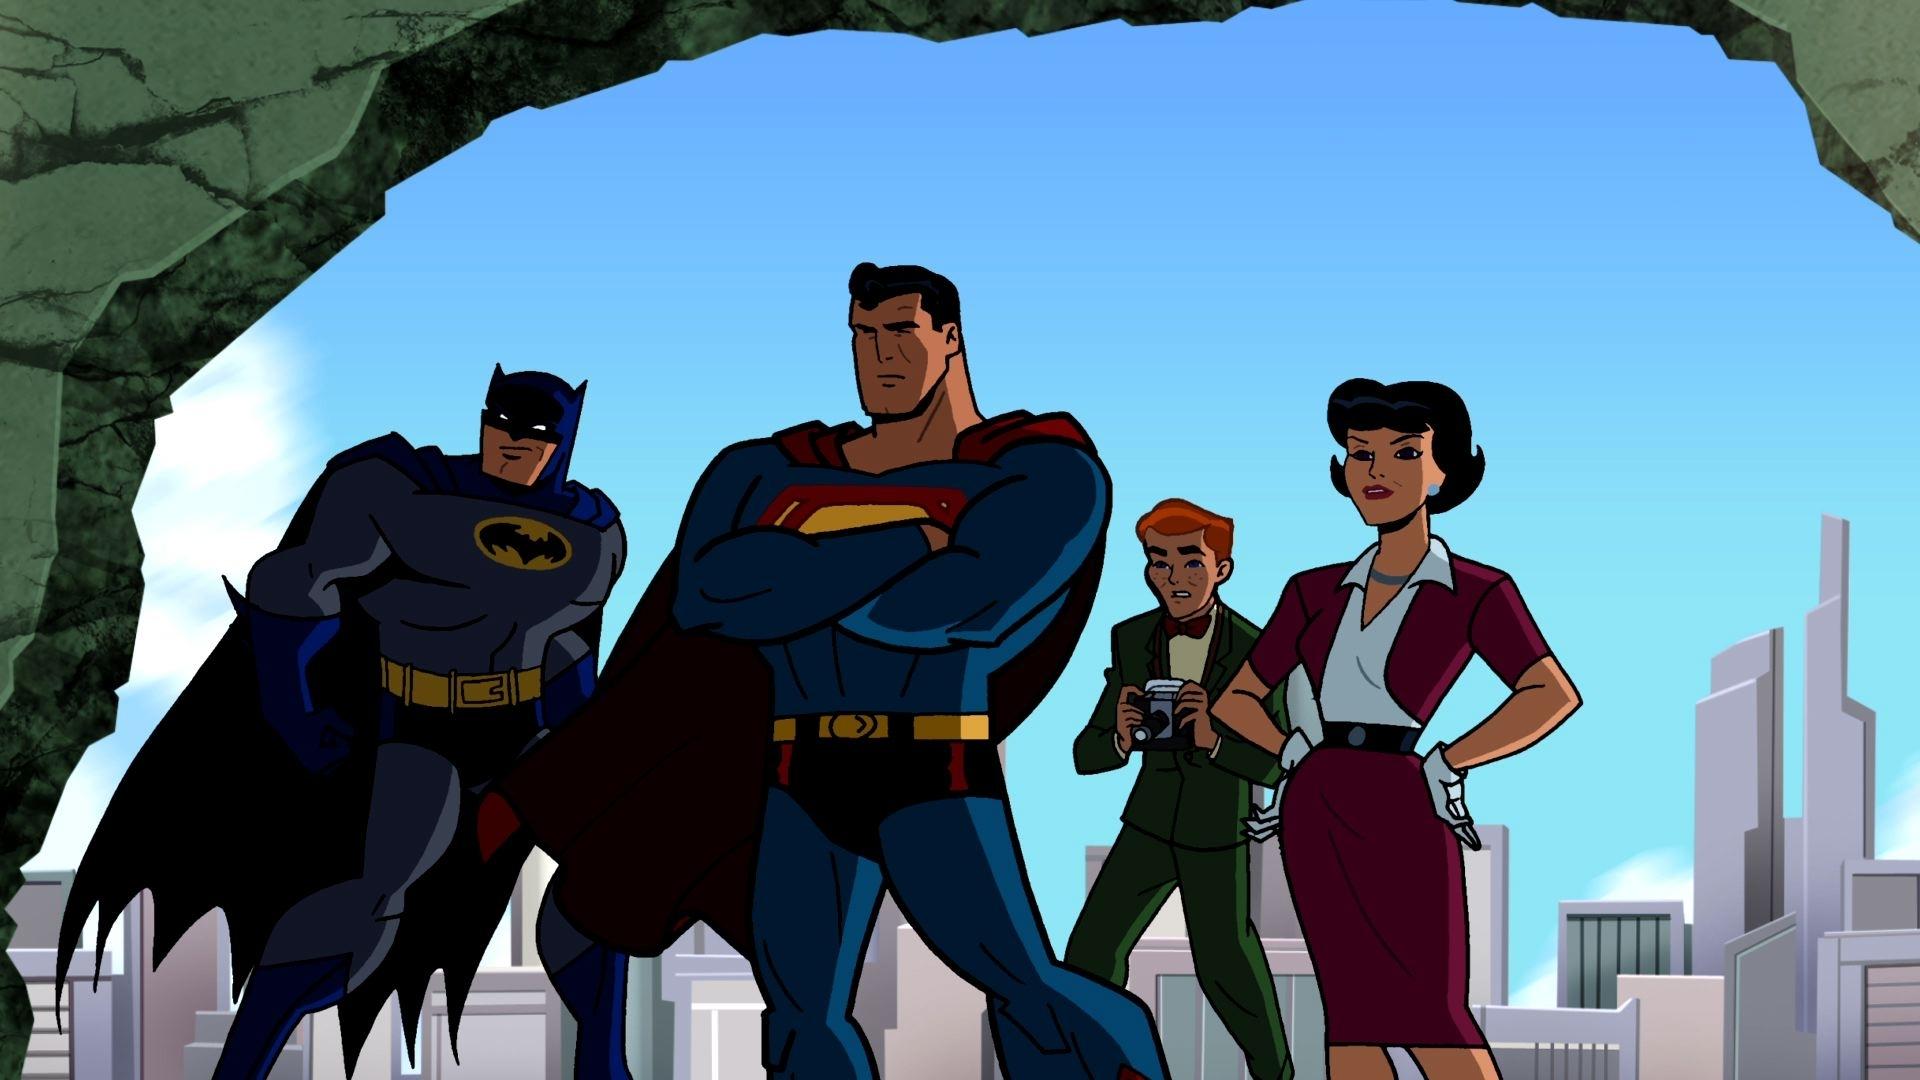 File:Battle of the Superheroes!.jpg